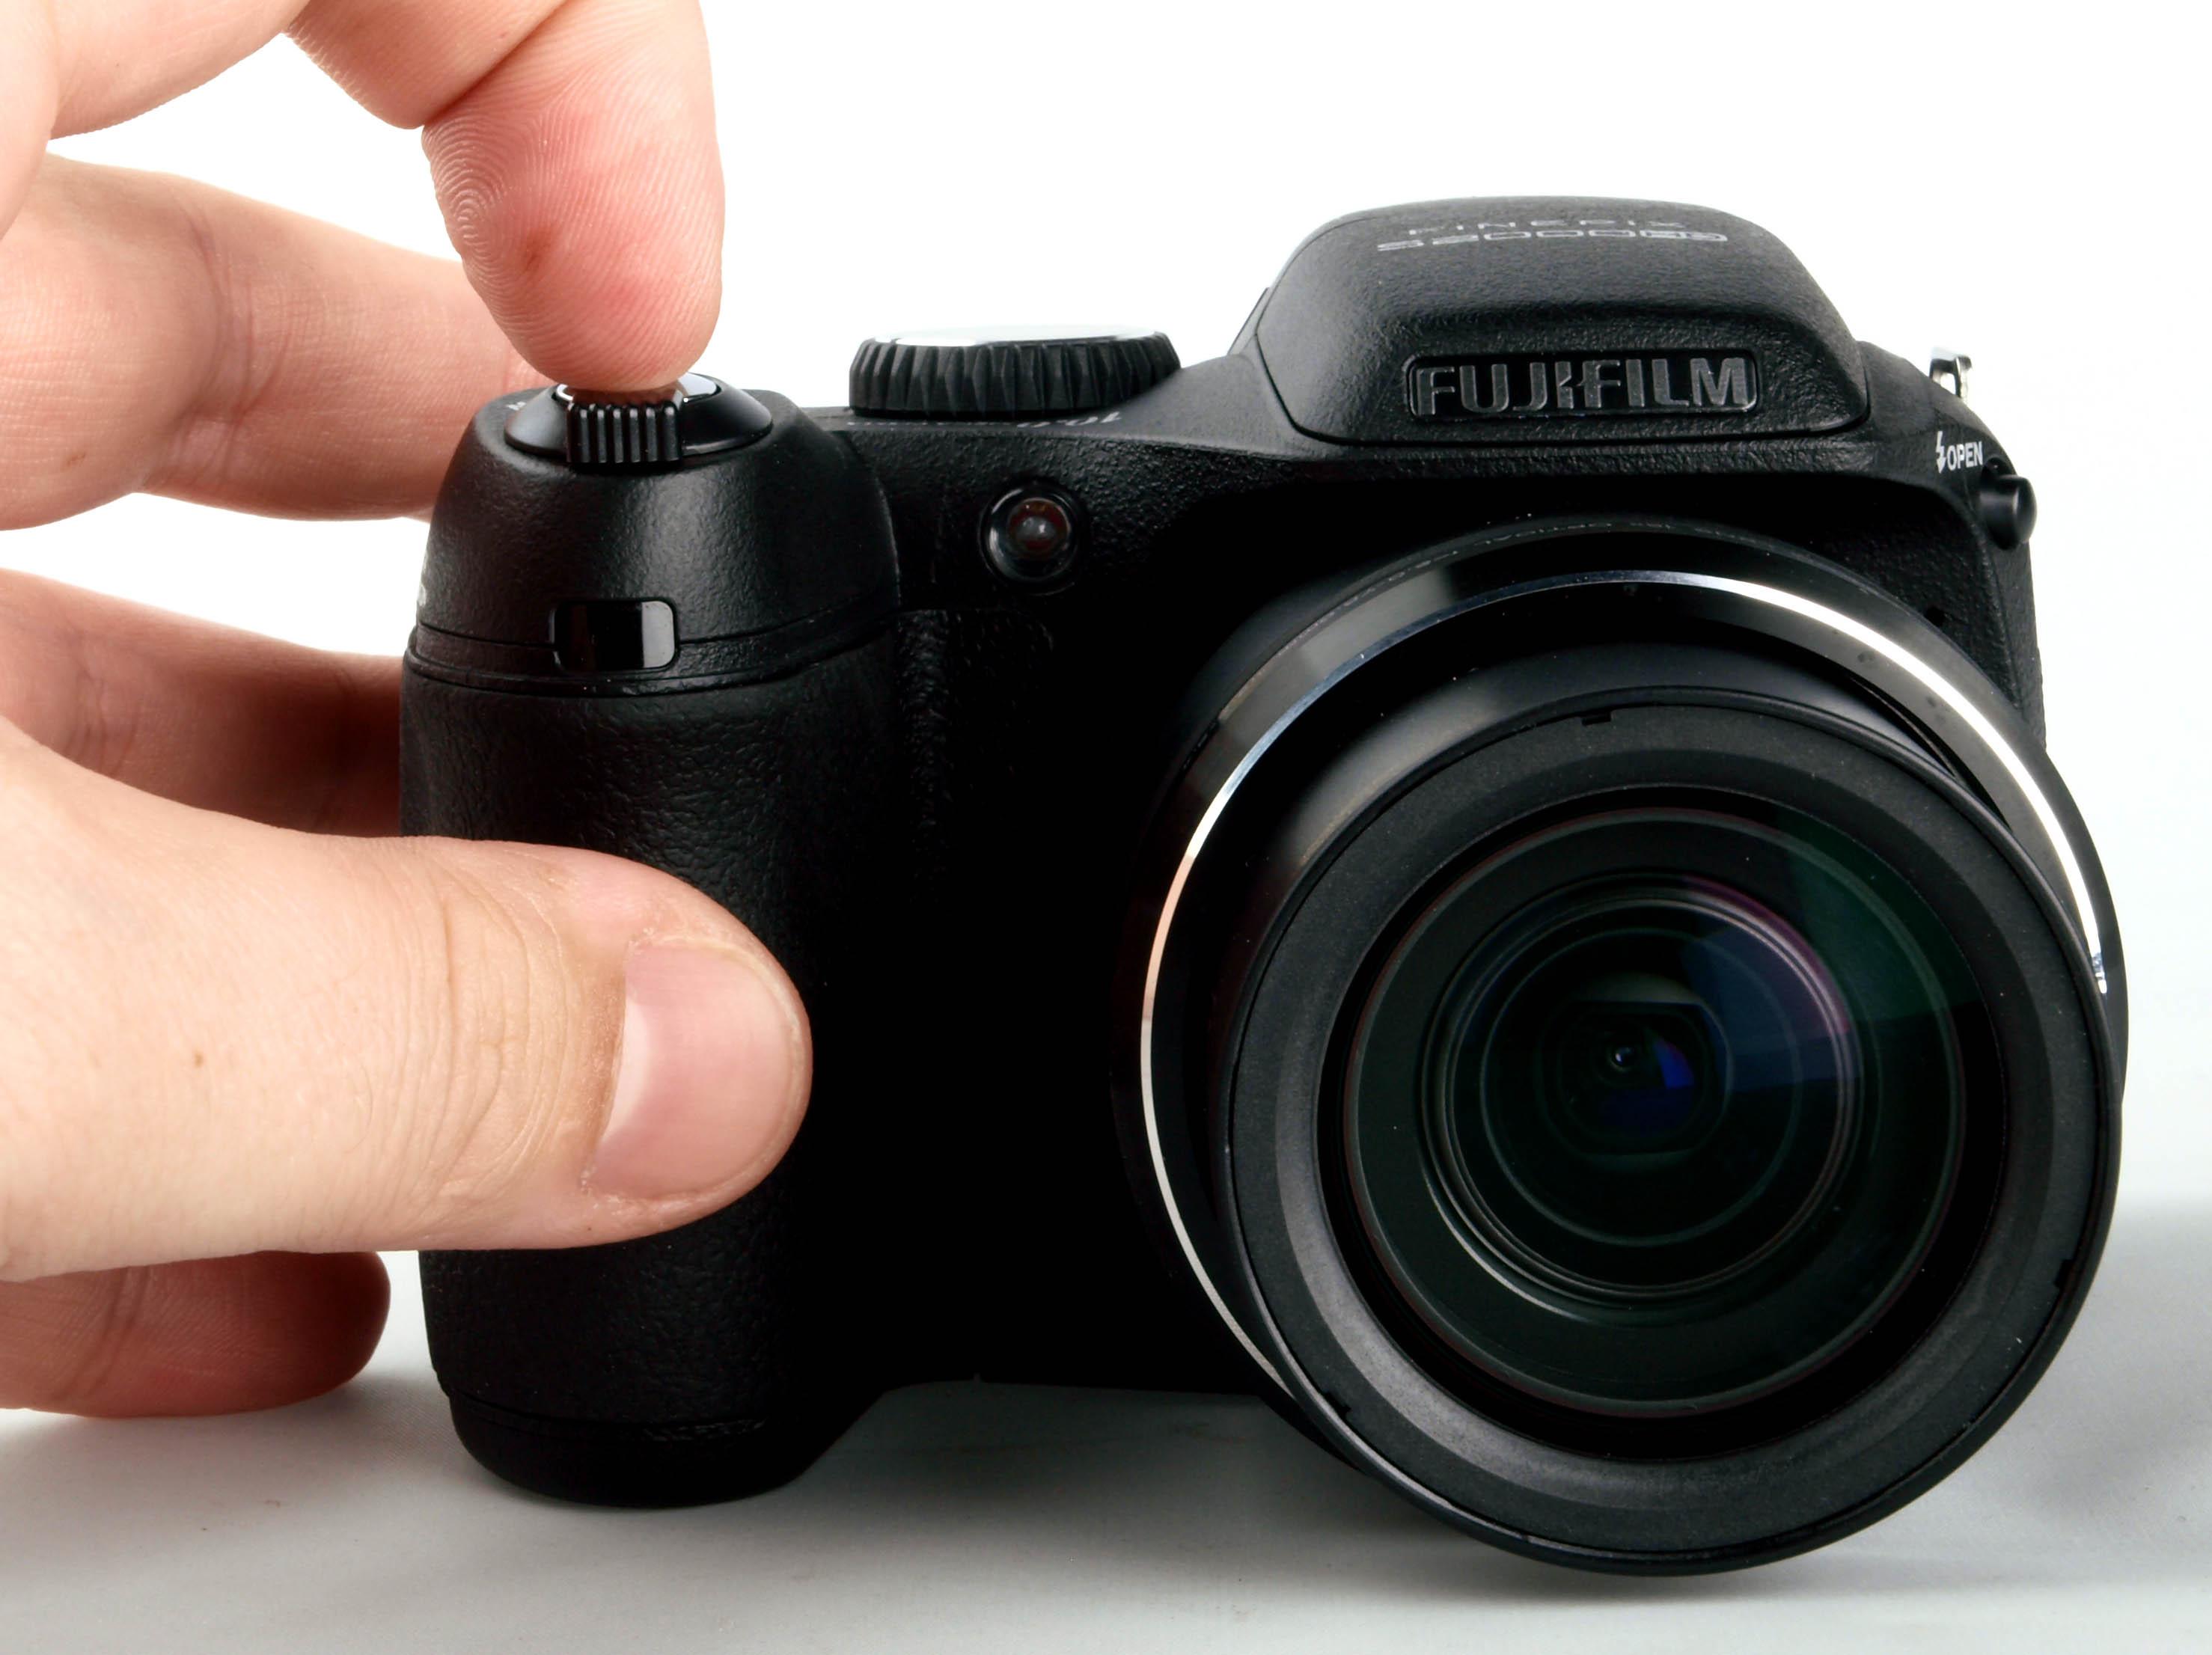 fujifilm finepix s2000hd digital camera review rh ephotozine com Fuji FinePix SLR Camera Fuji FinePix 16MP Digital Camera